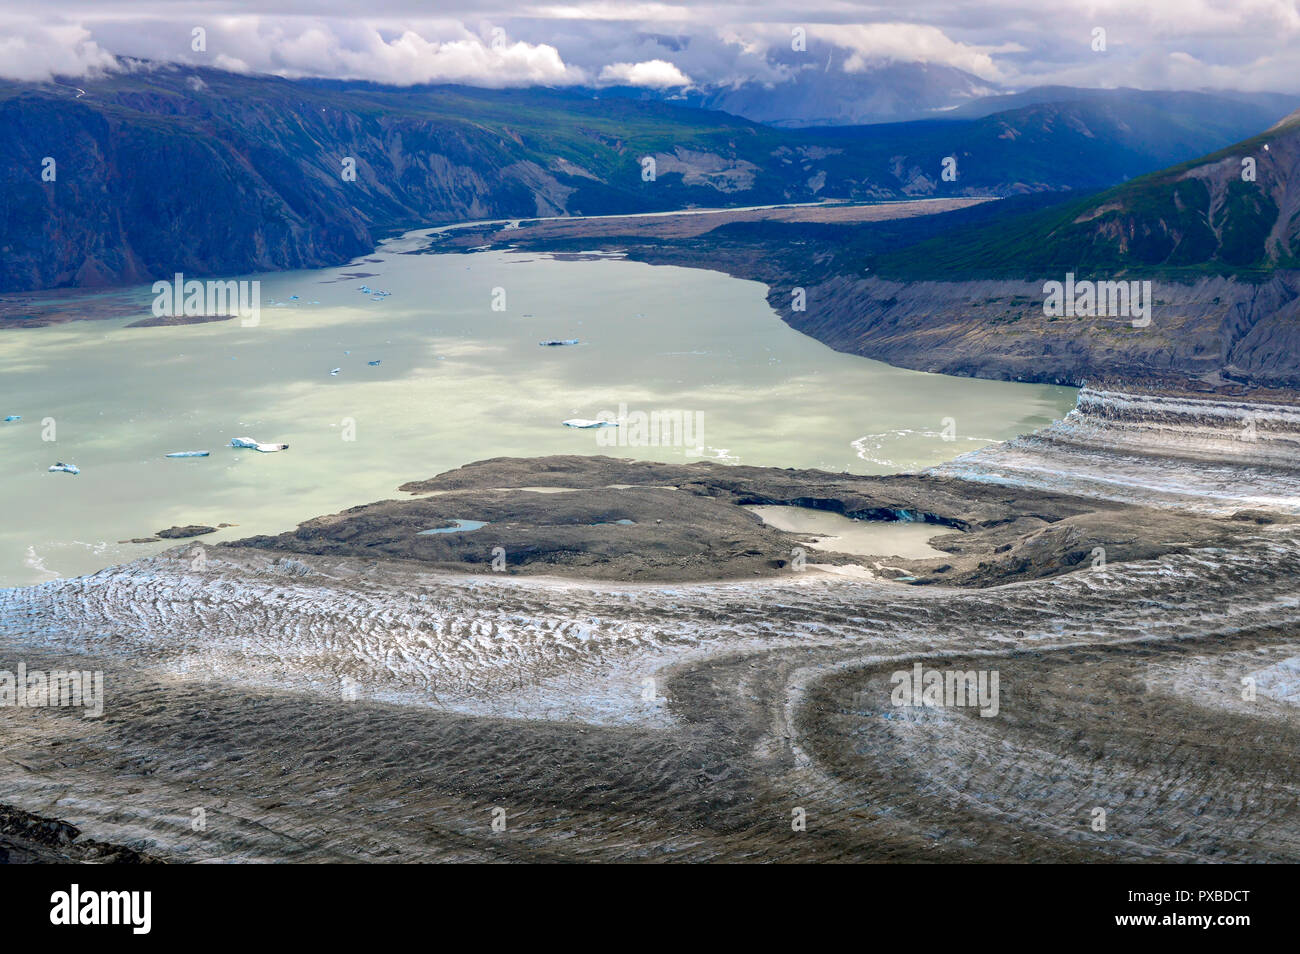 Lowell Glacier Edge and Lake with Icebergs, Kluane National Park, Yukon - Stock Image